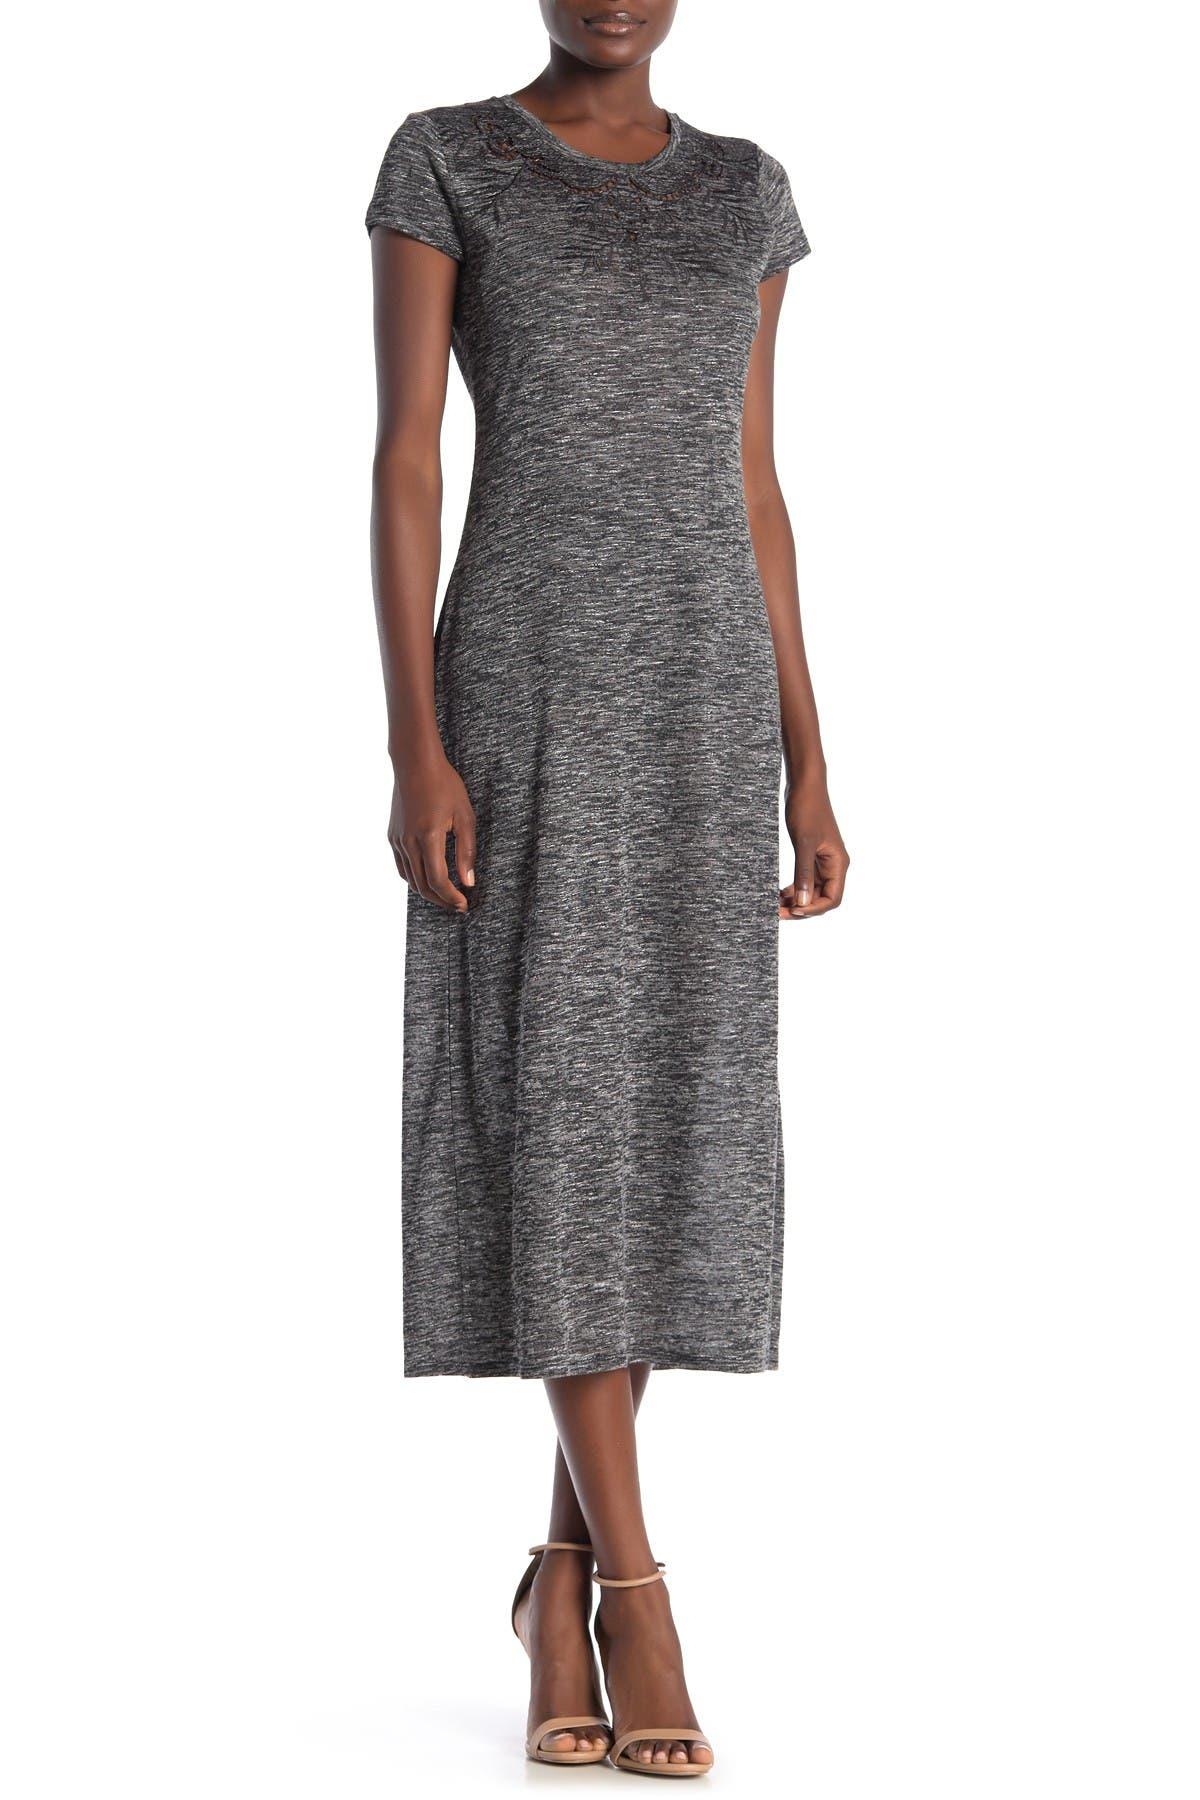 Image of Love Stitch Short Sleeve Midi Dress